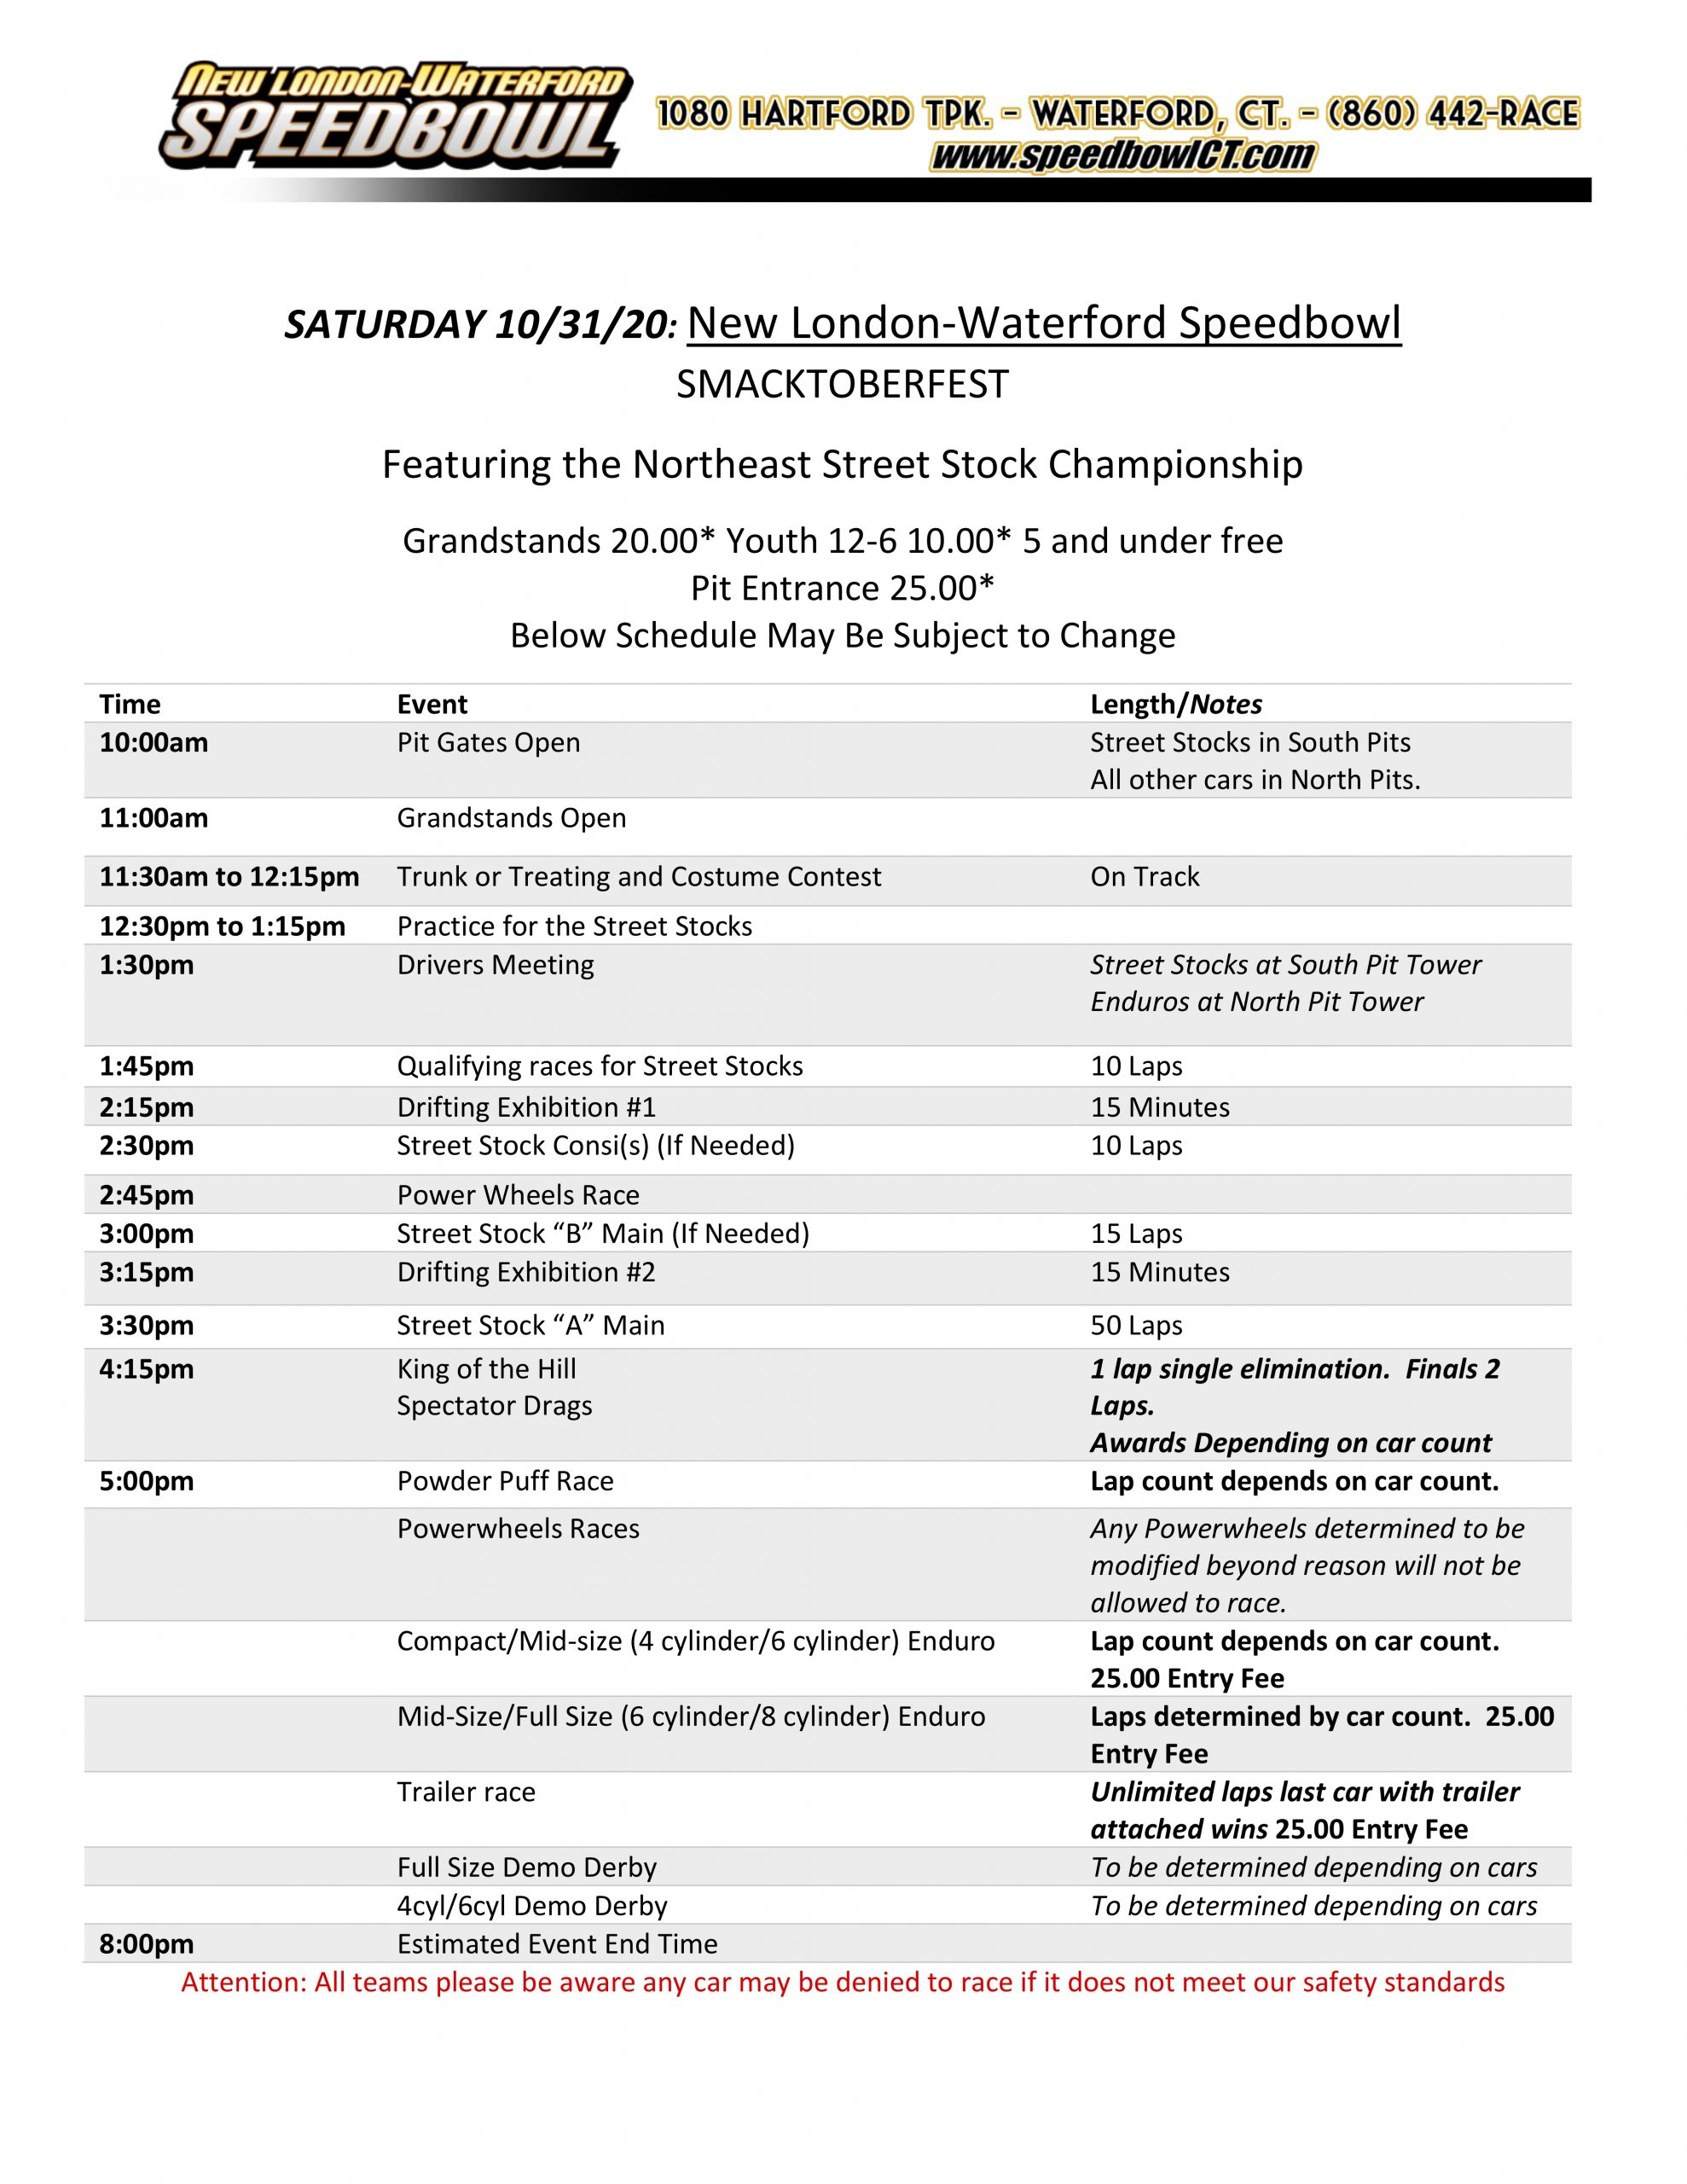 Smacktoberfest Event Schedule 10-31-20